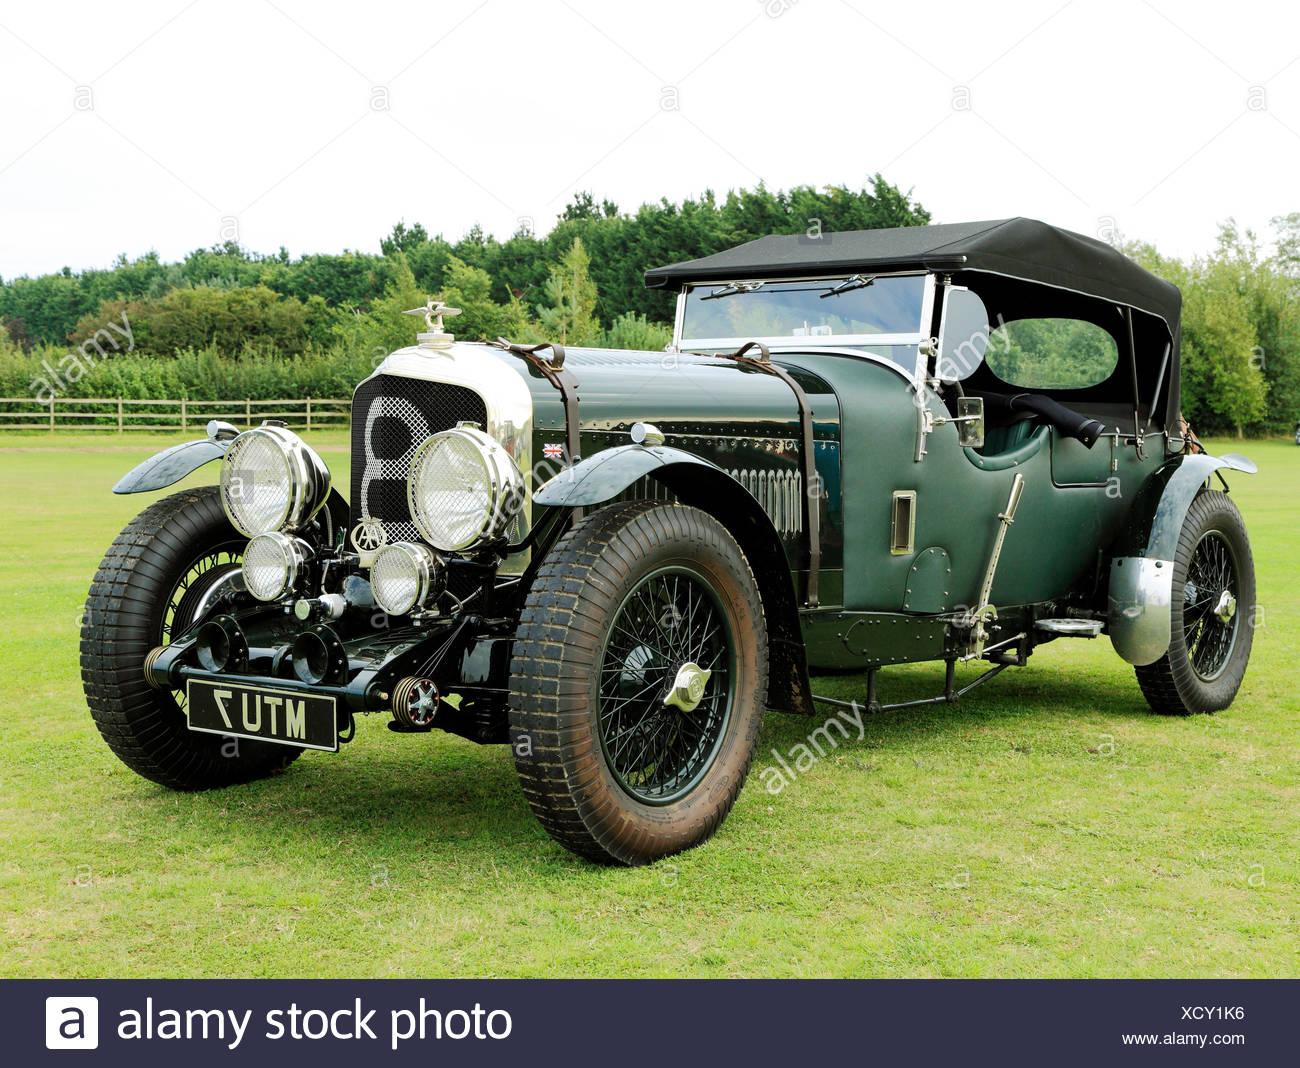 1930 Bentley Stock Photos & 1930 Bentley Stock Images - Alamy